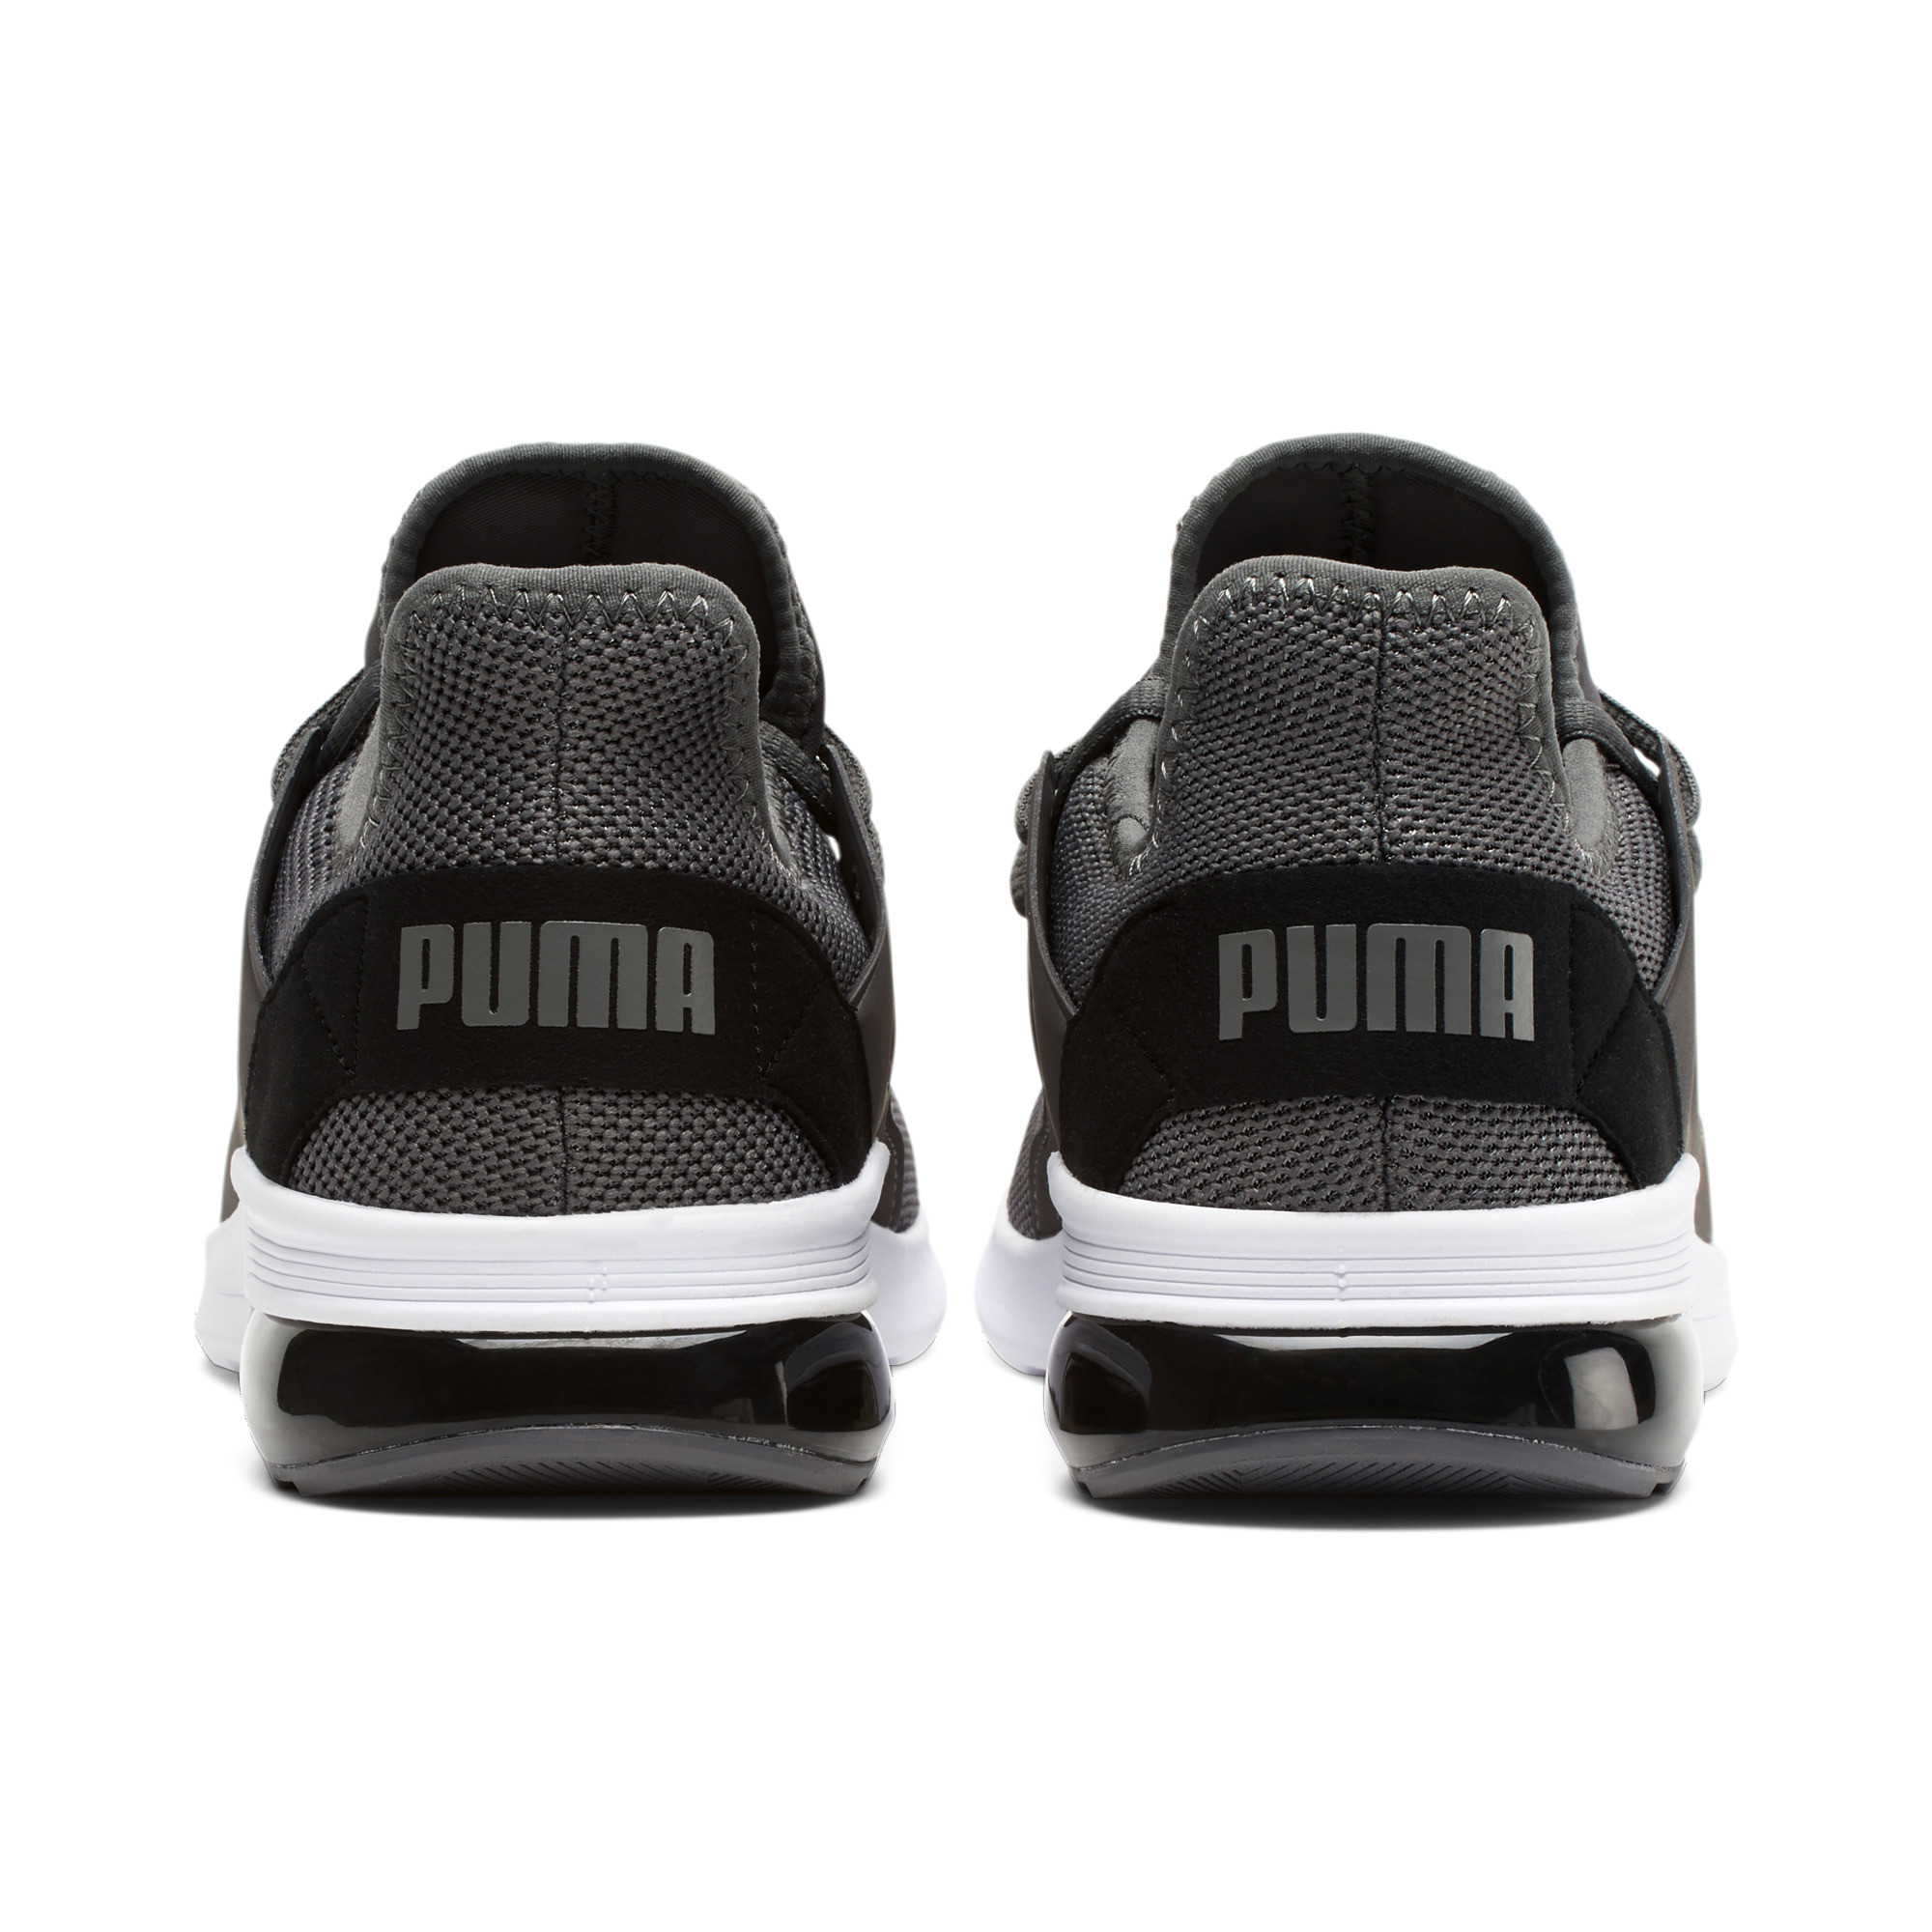 PUMA-Men-039-s-Electron-Street-Sneakers thumbnail 22